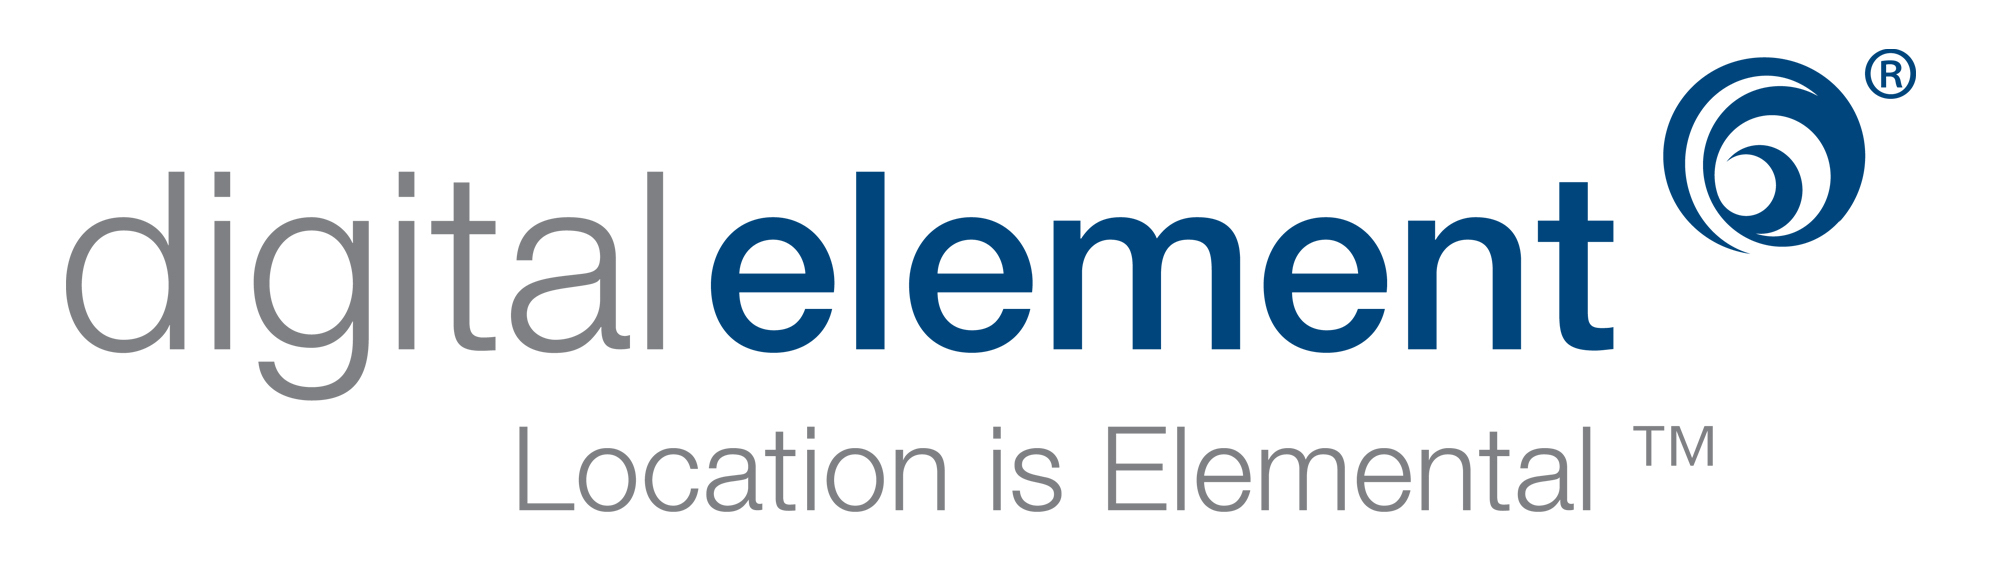 Digital Element Logo Digital Element Logo_nov 2014